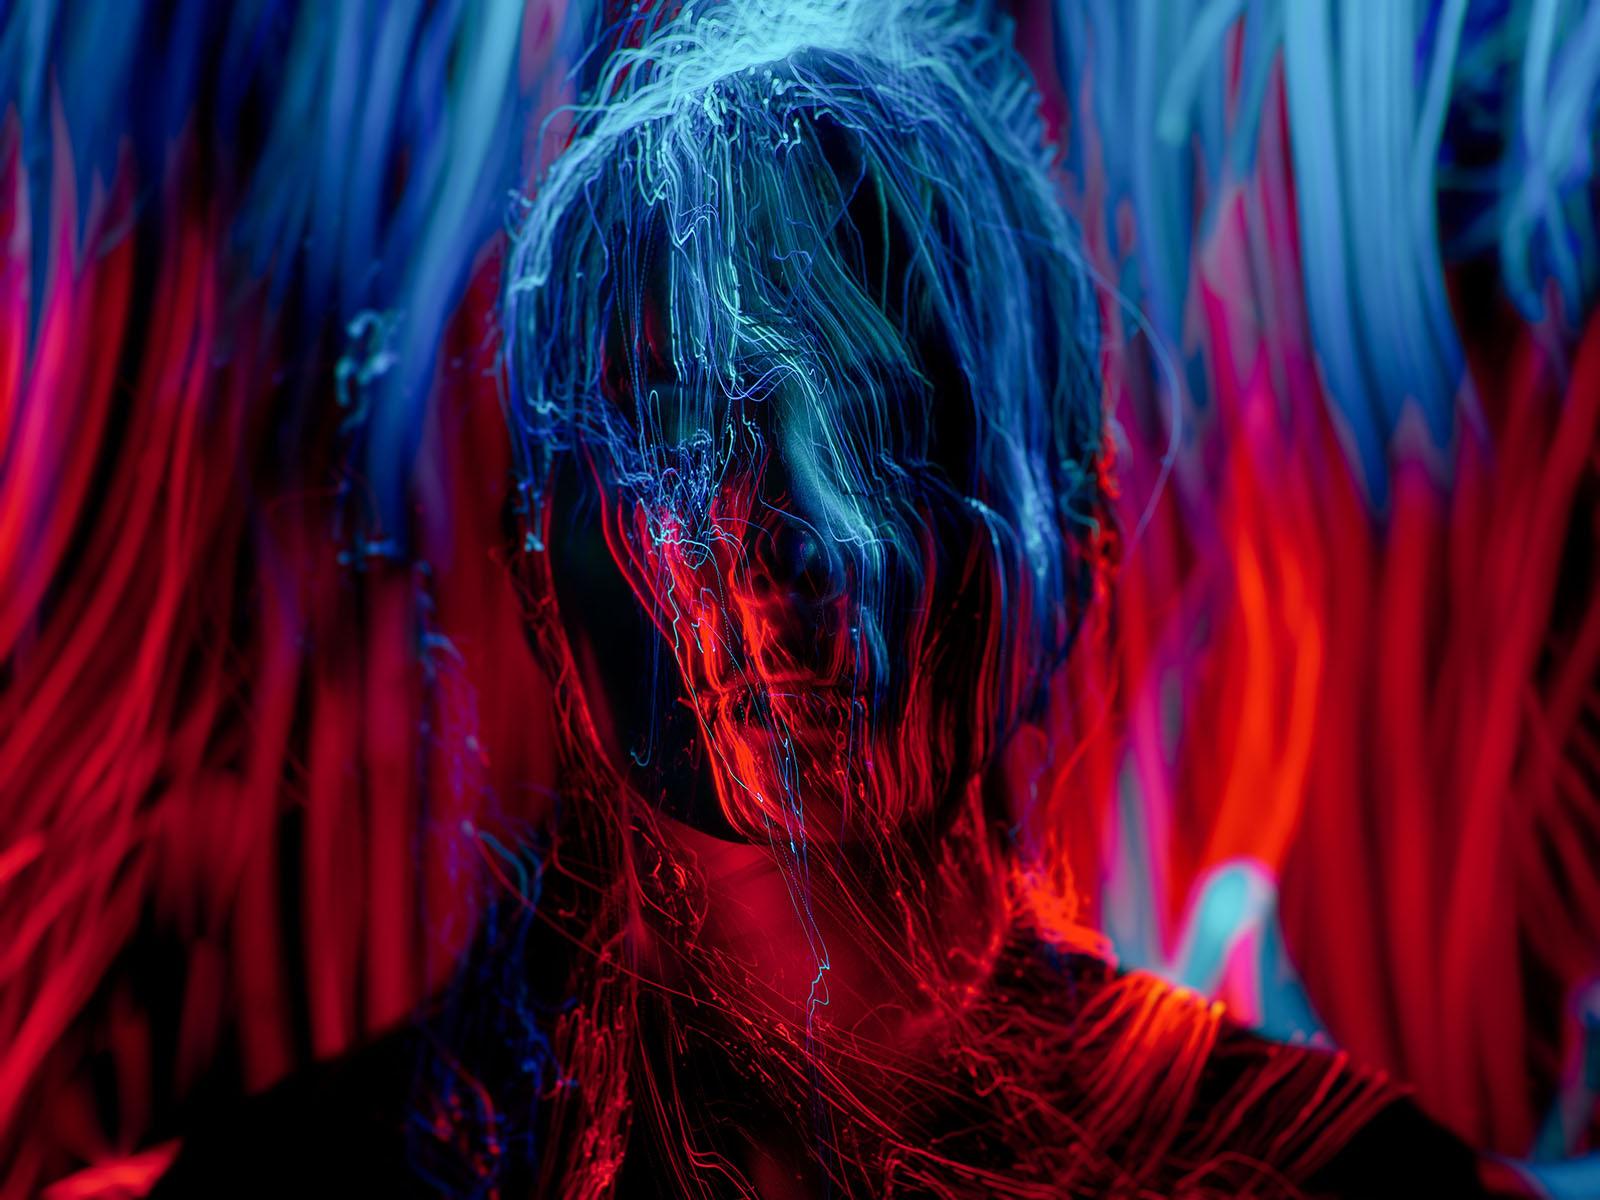 ©Sergey Katyshkin - Lightpainting portrait